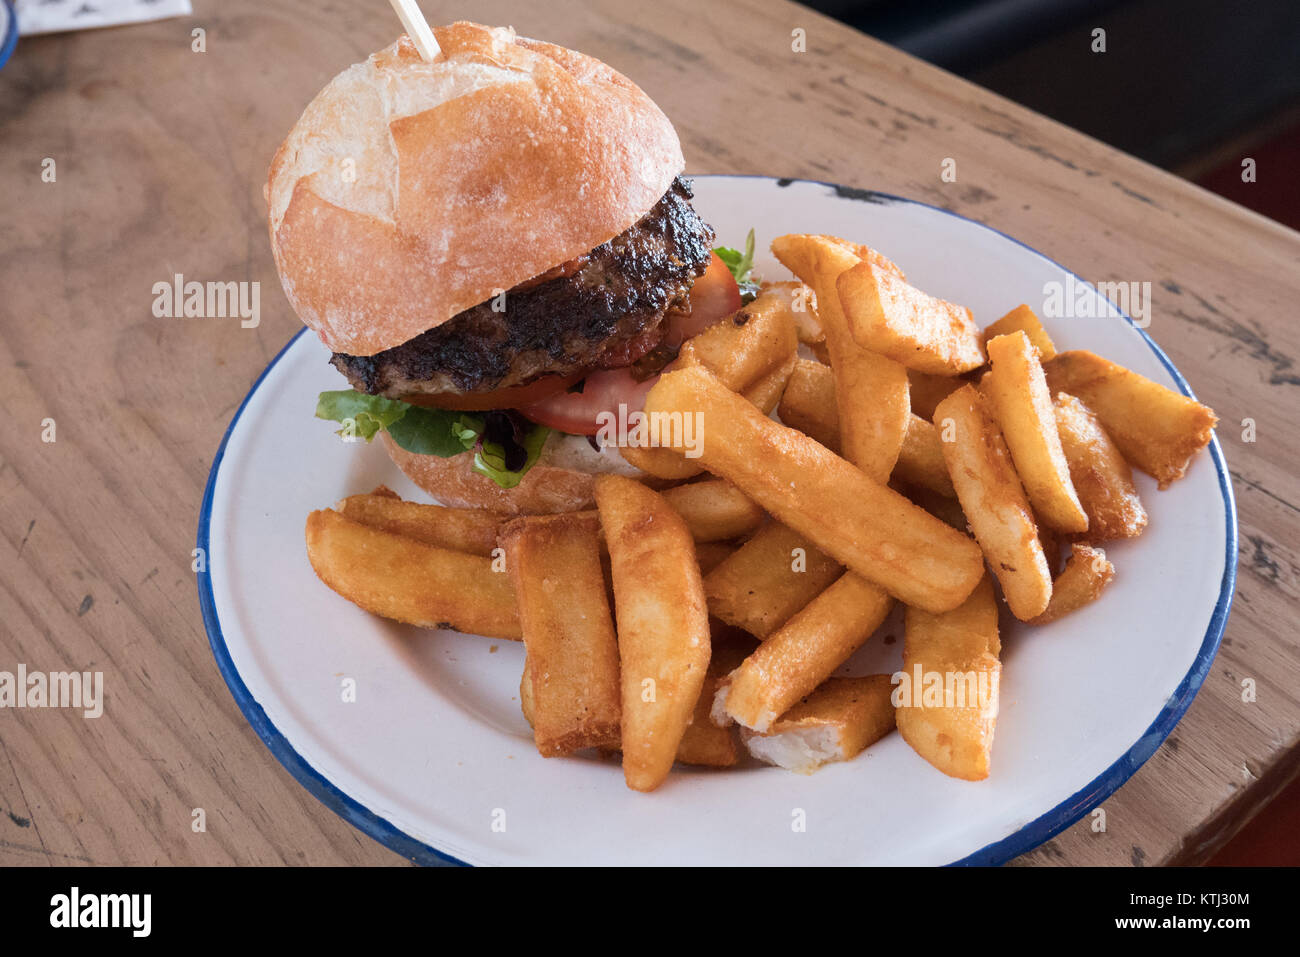 Australian gourmet burger de boeuf Photo Stock